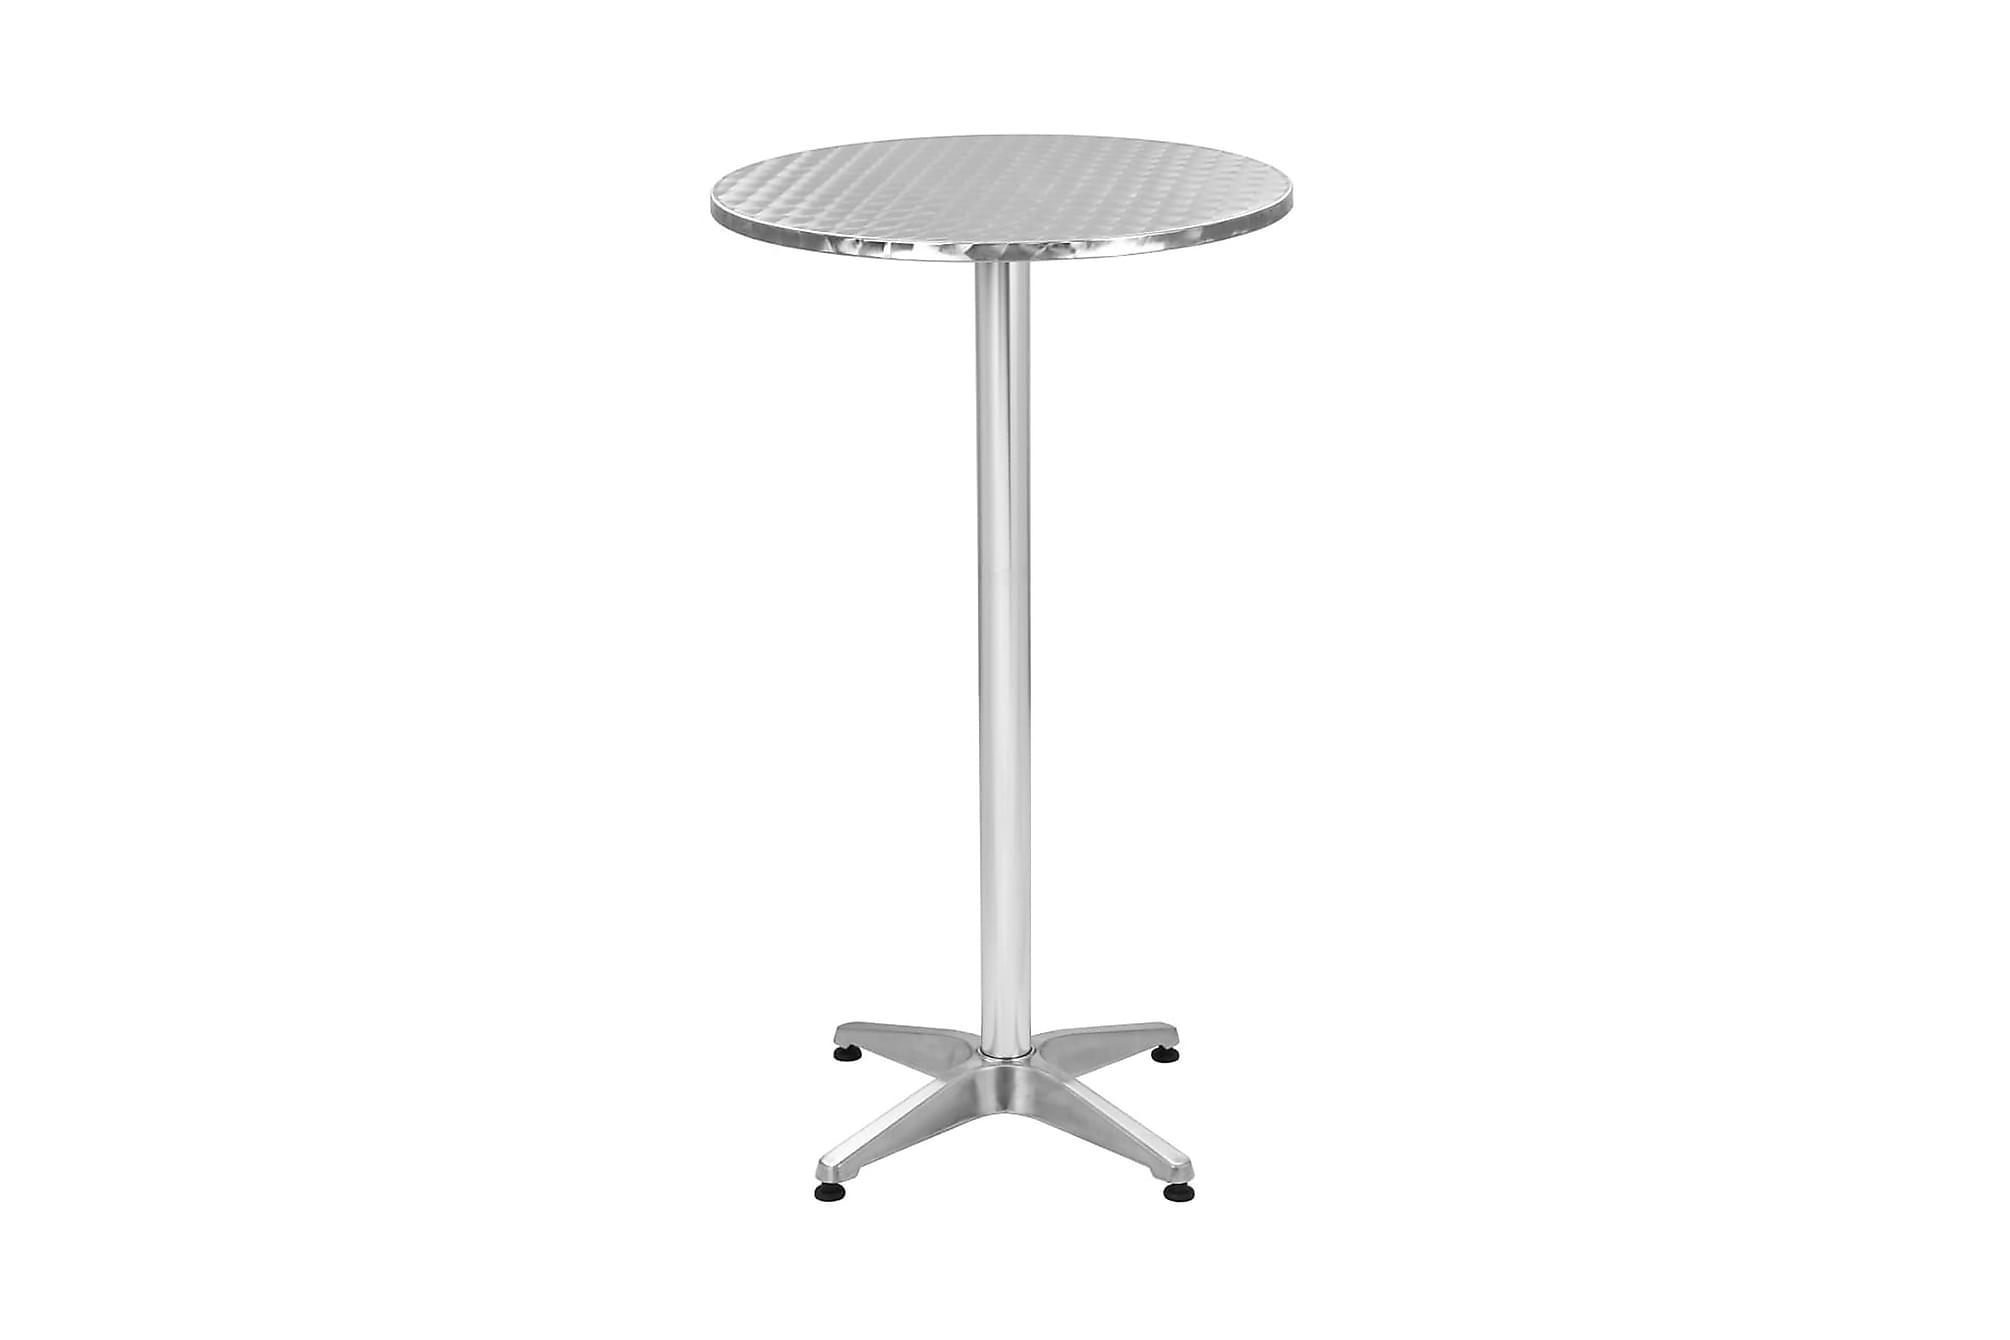 Hopfällbart trädgårdsbord i aluminium Ø 60 cm